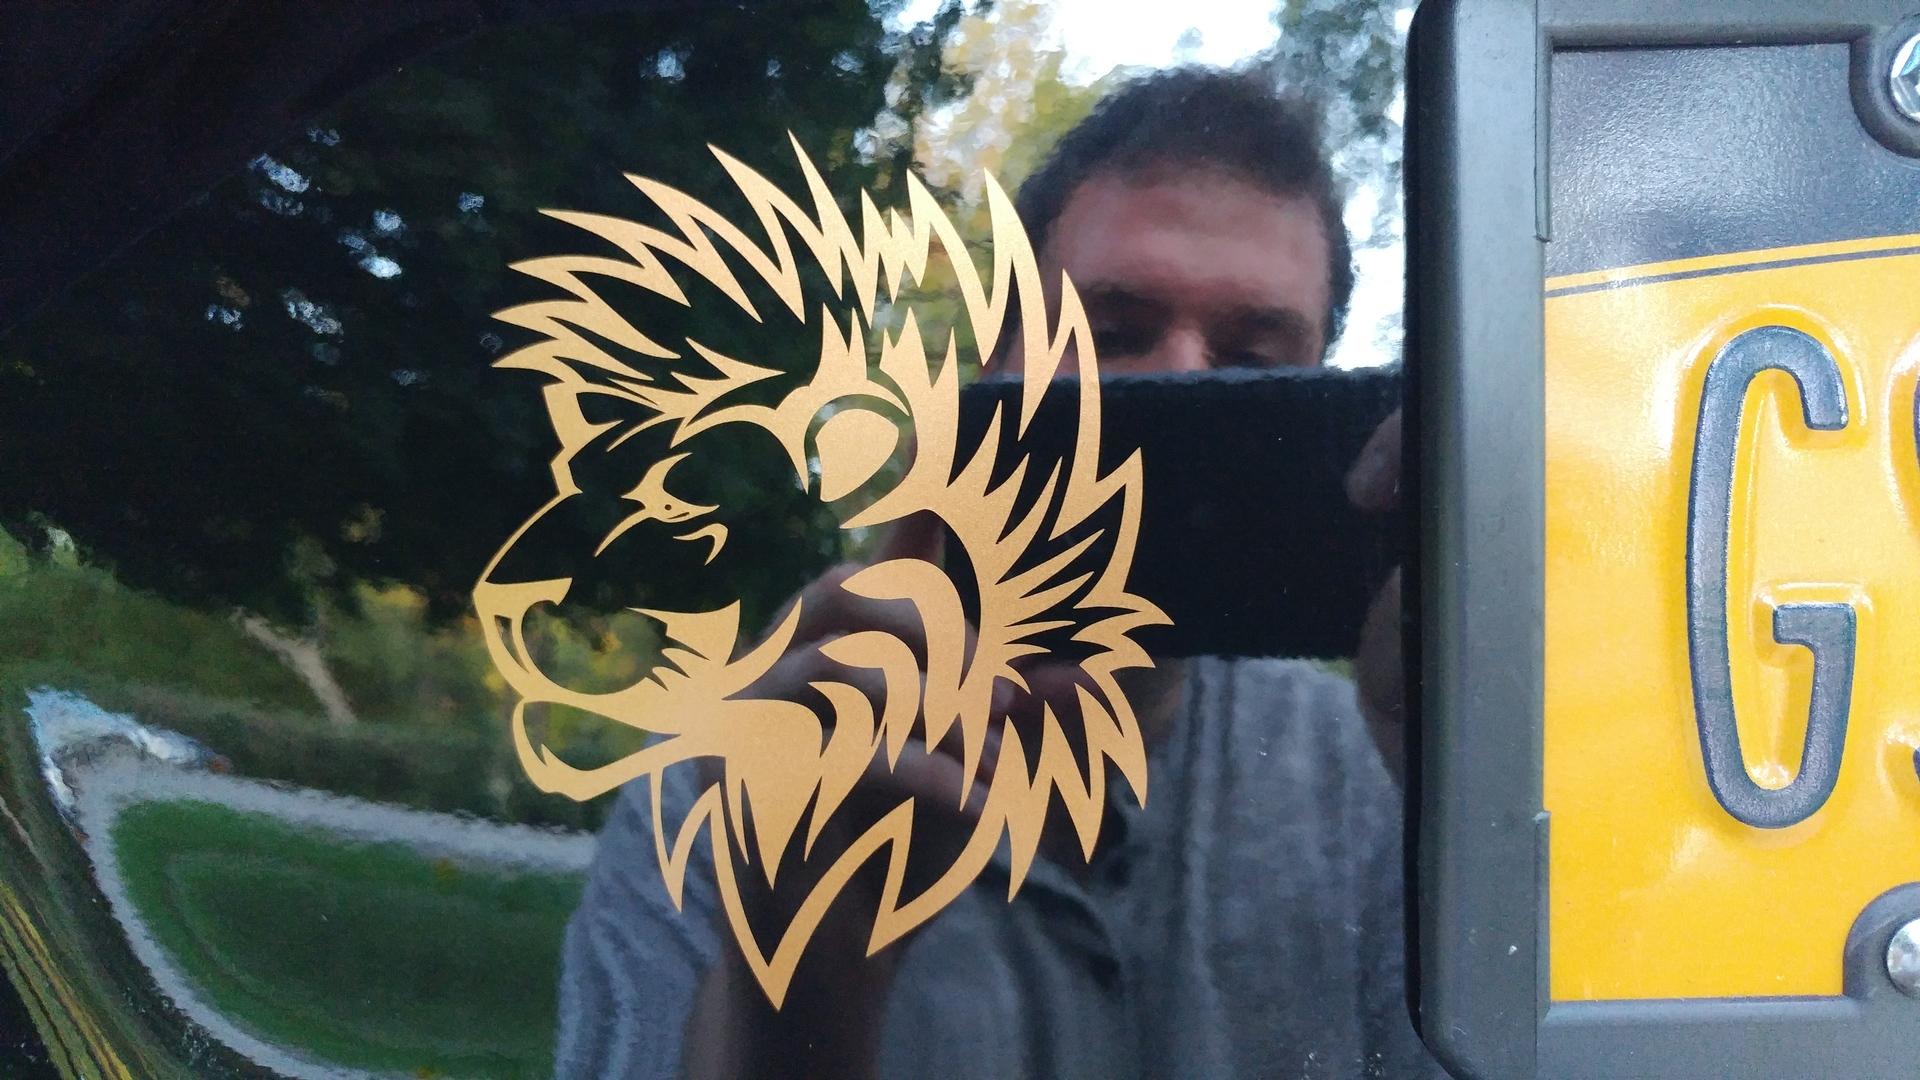 Matt's photograph of their Lion With Furry Mane Sticker